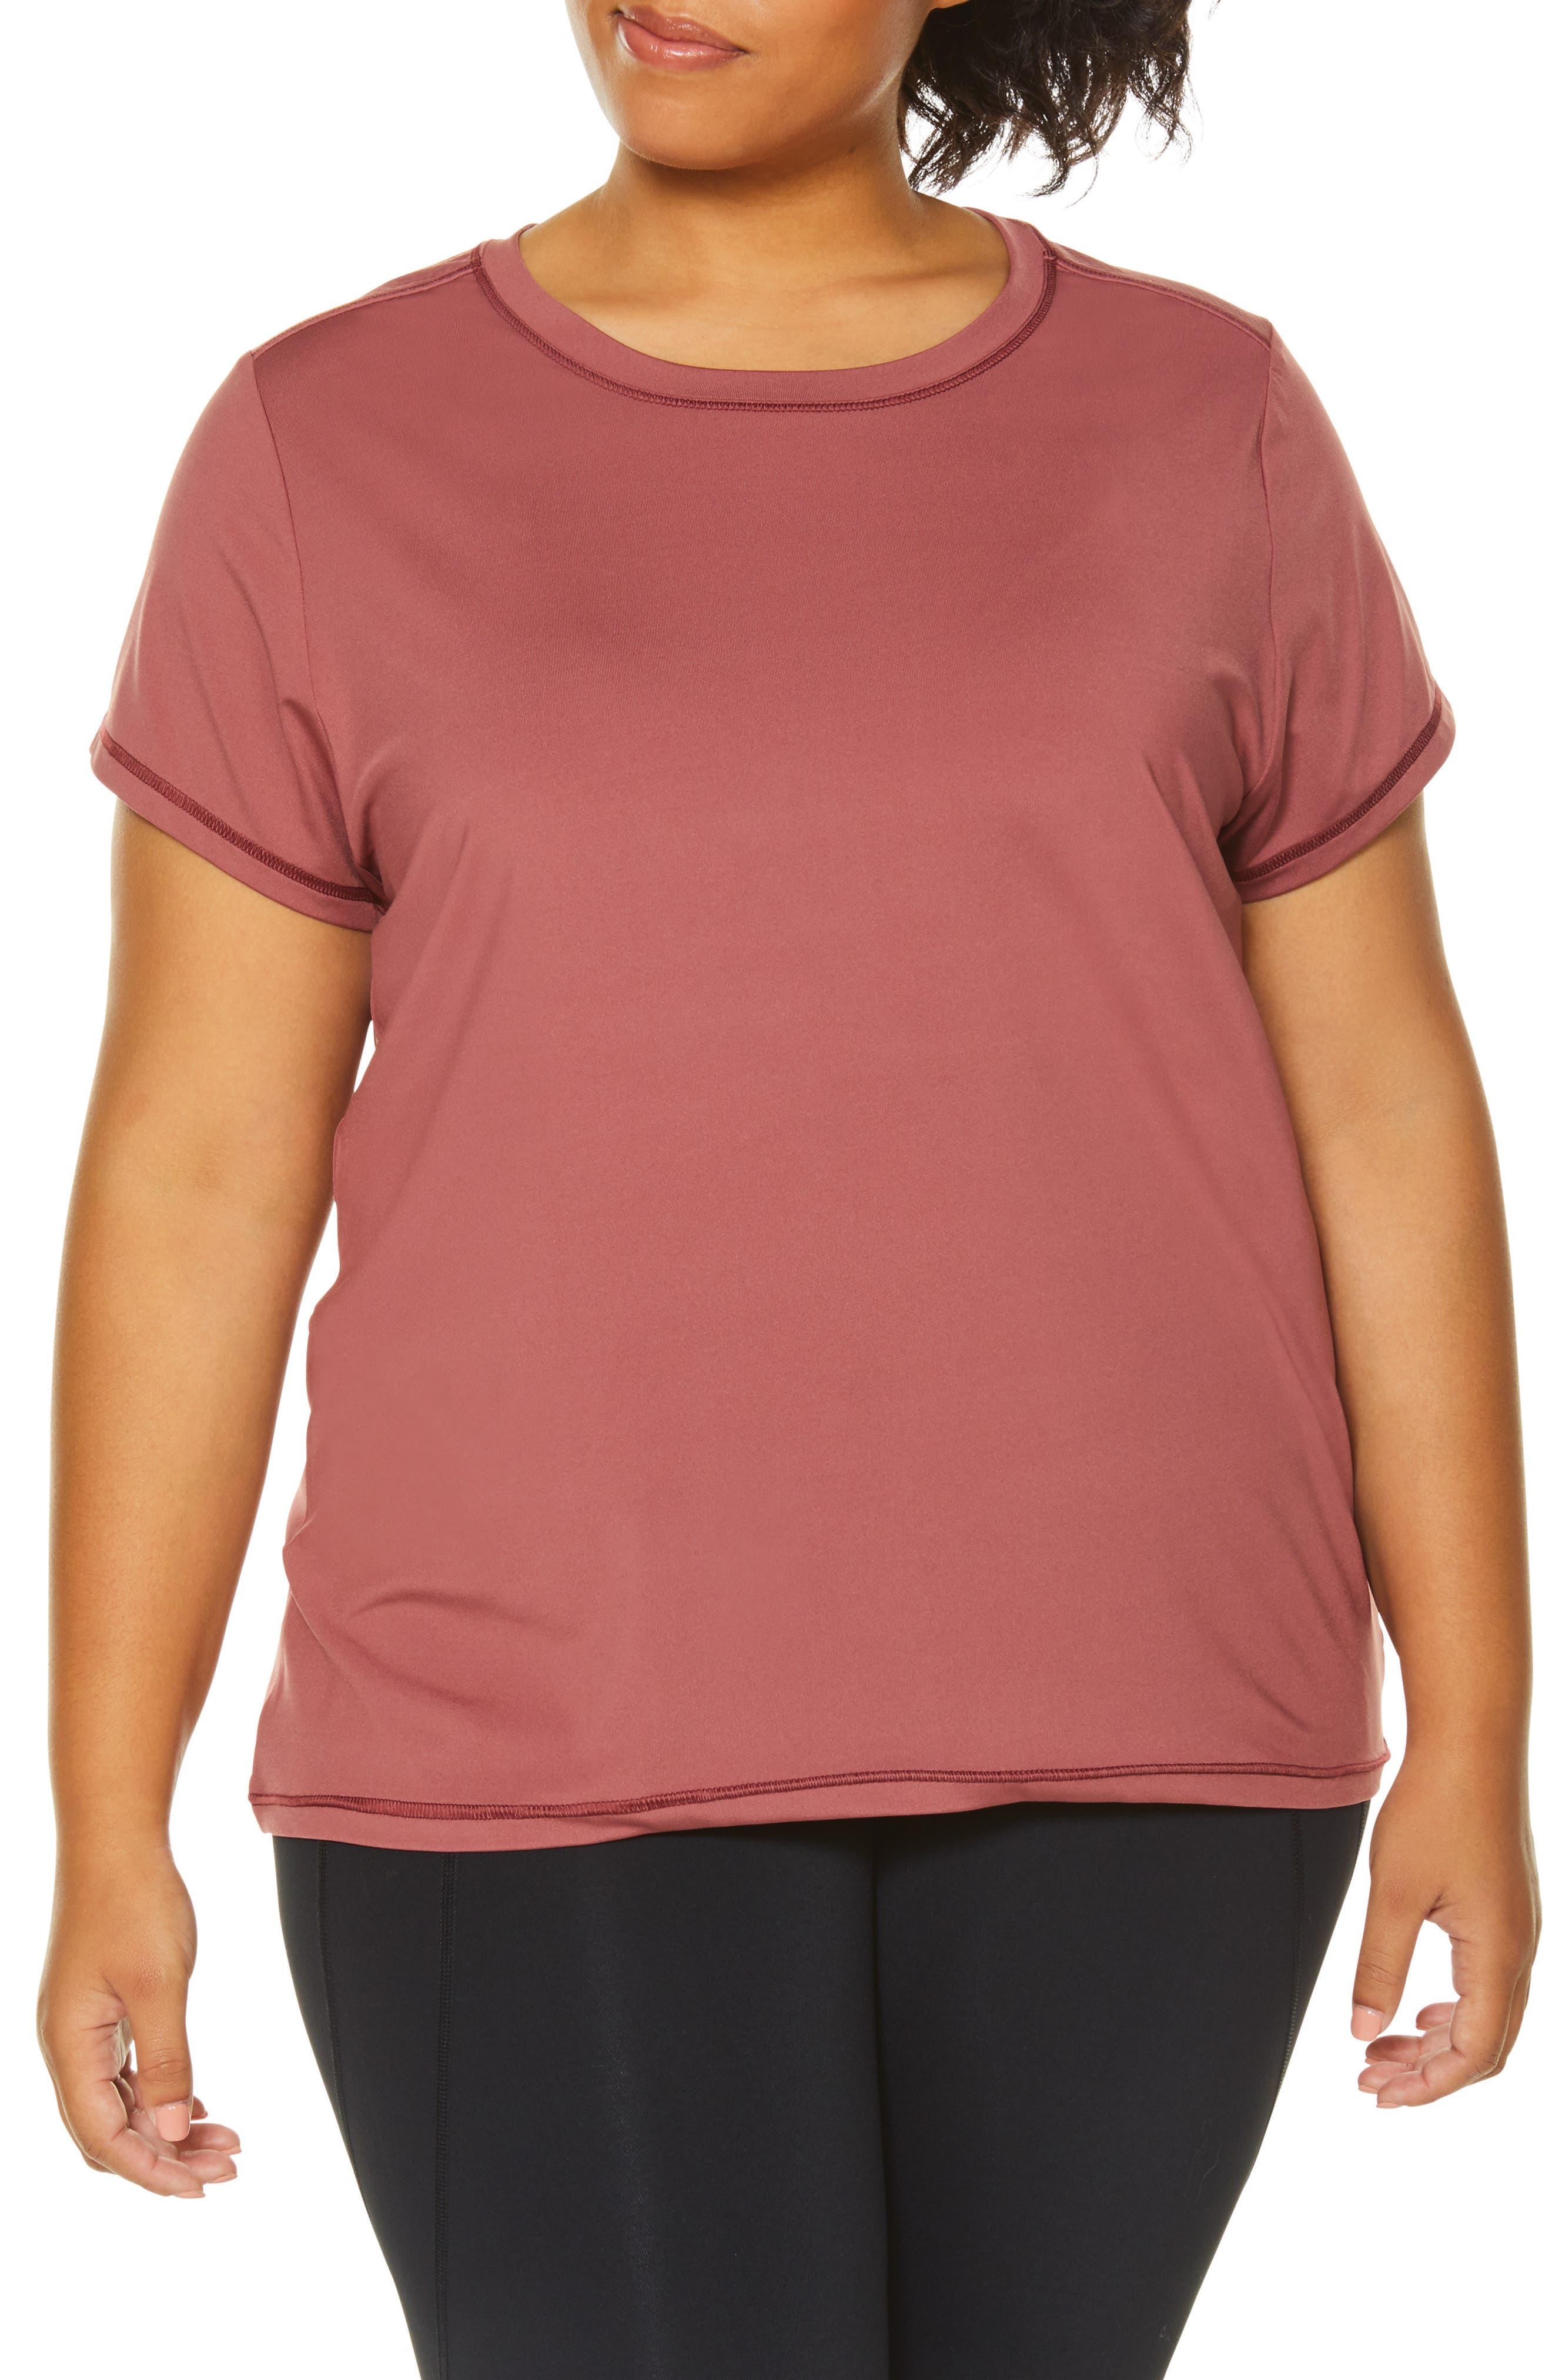 Plus Size Shape Activewear Wishbone Tee, Burgundy